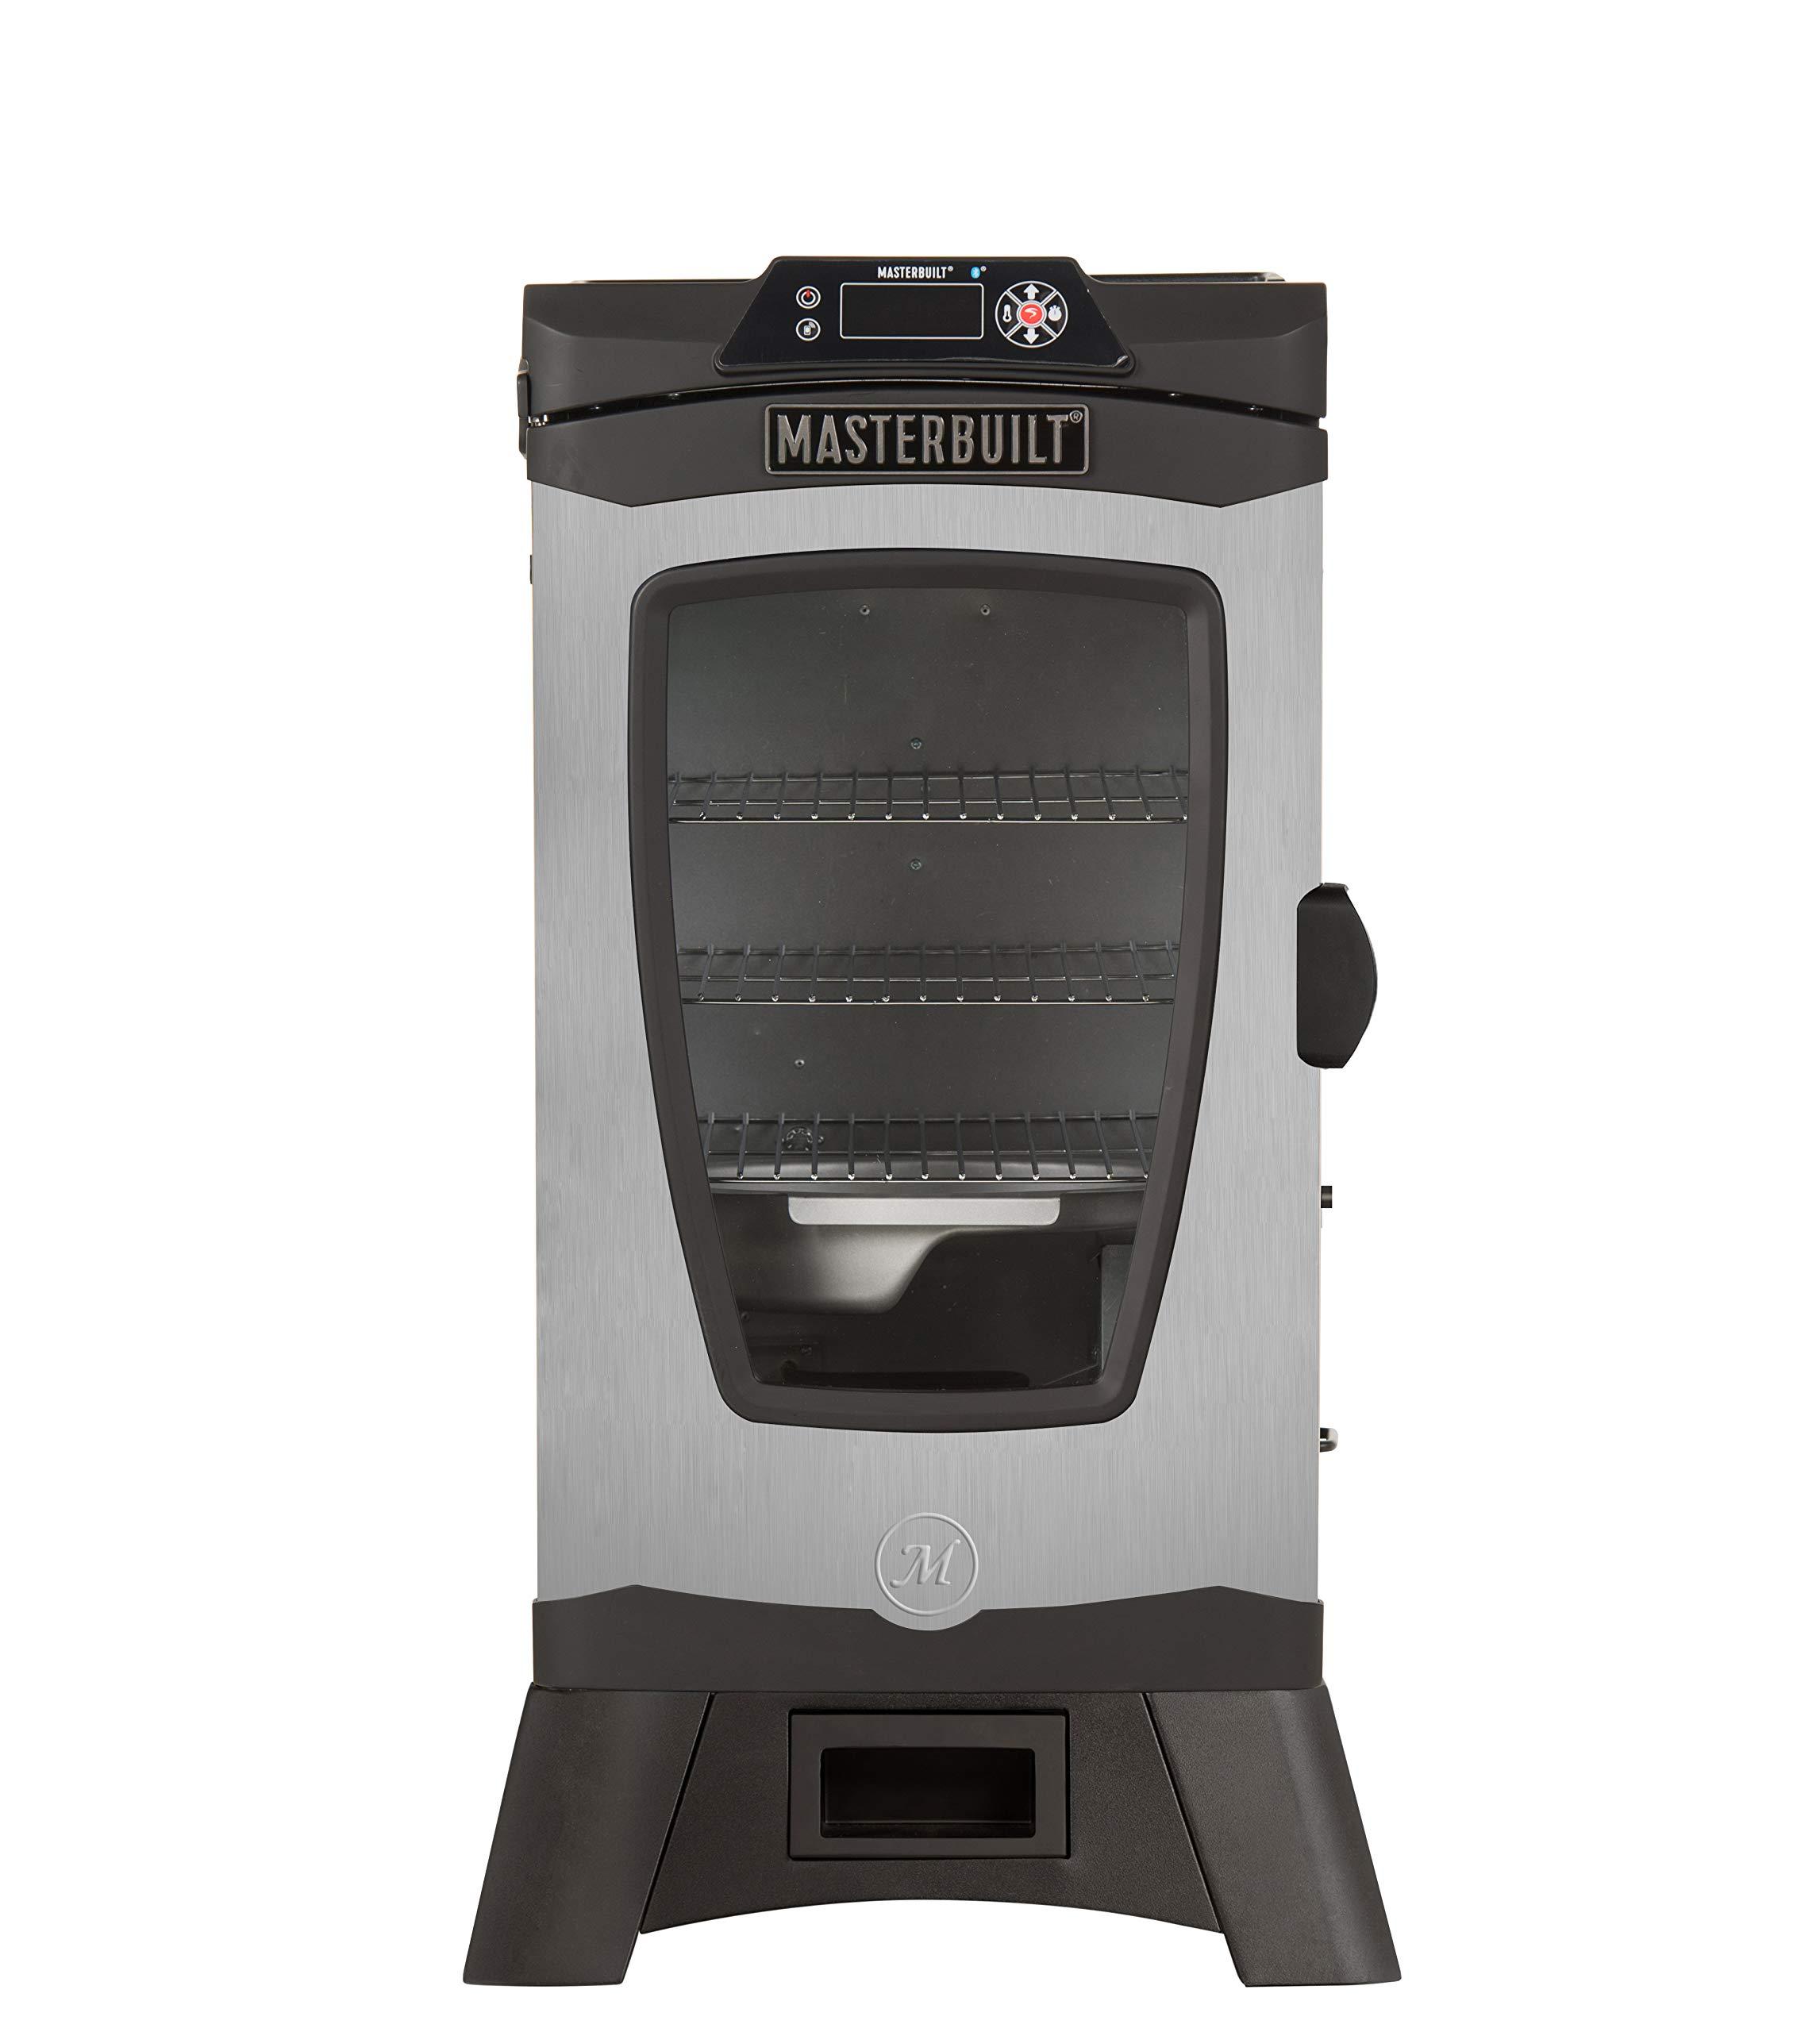 Masterbuilt MES 430S Bluetooth Digital Electric Smoker, 30'' by Masterbuilt